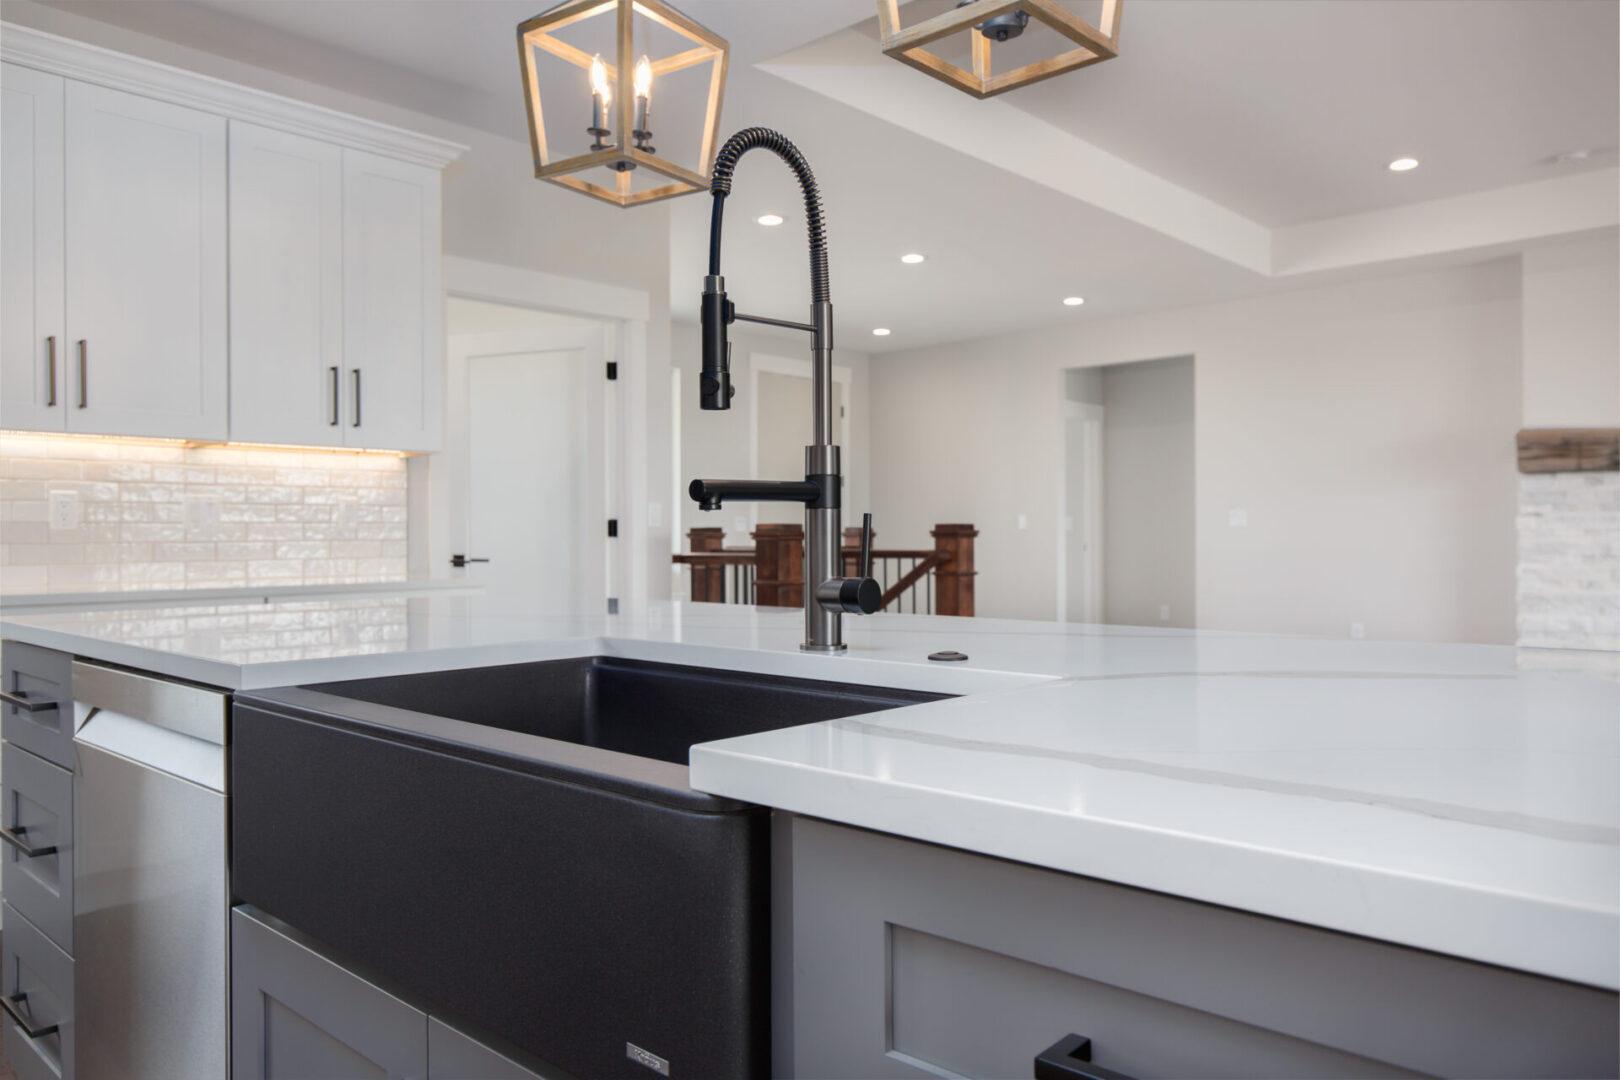 modern kitchen with sleek faucet